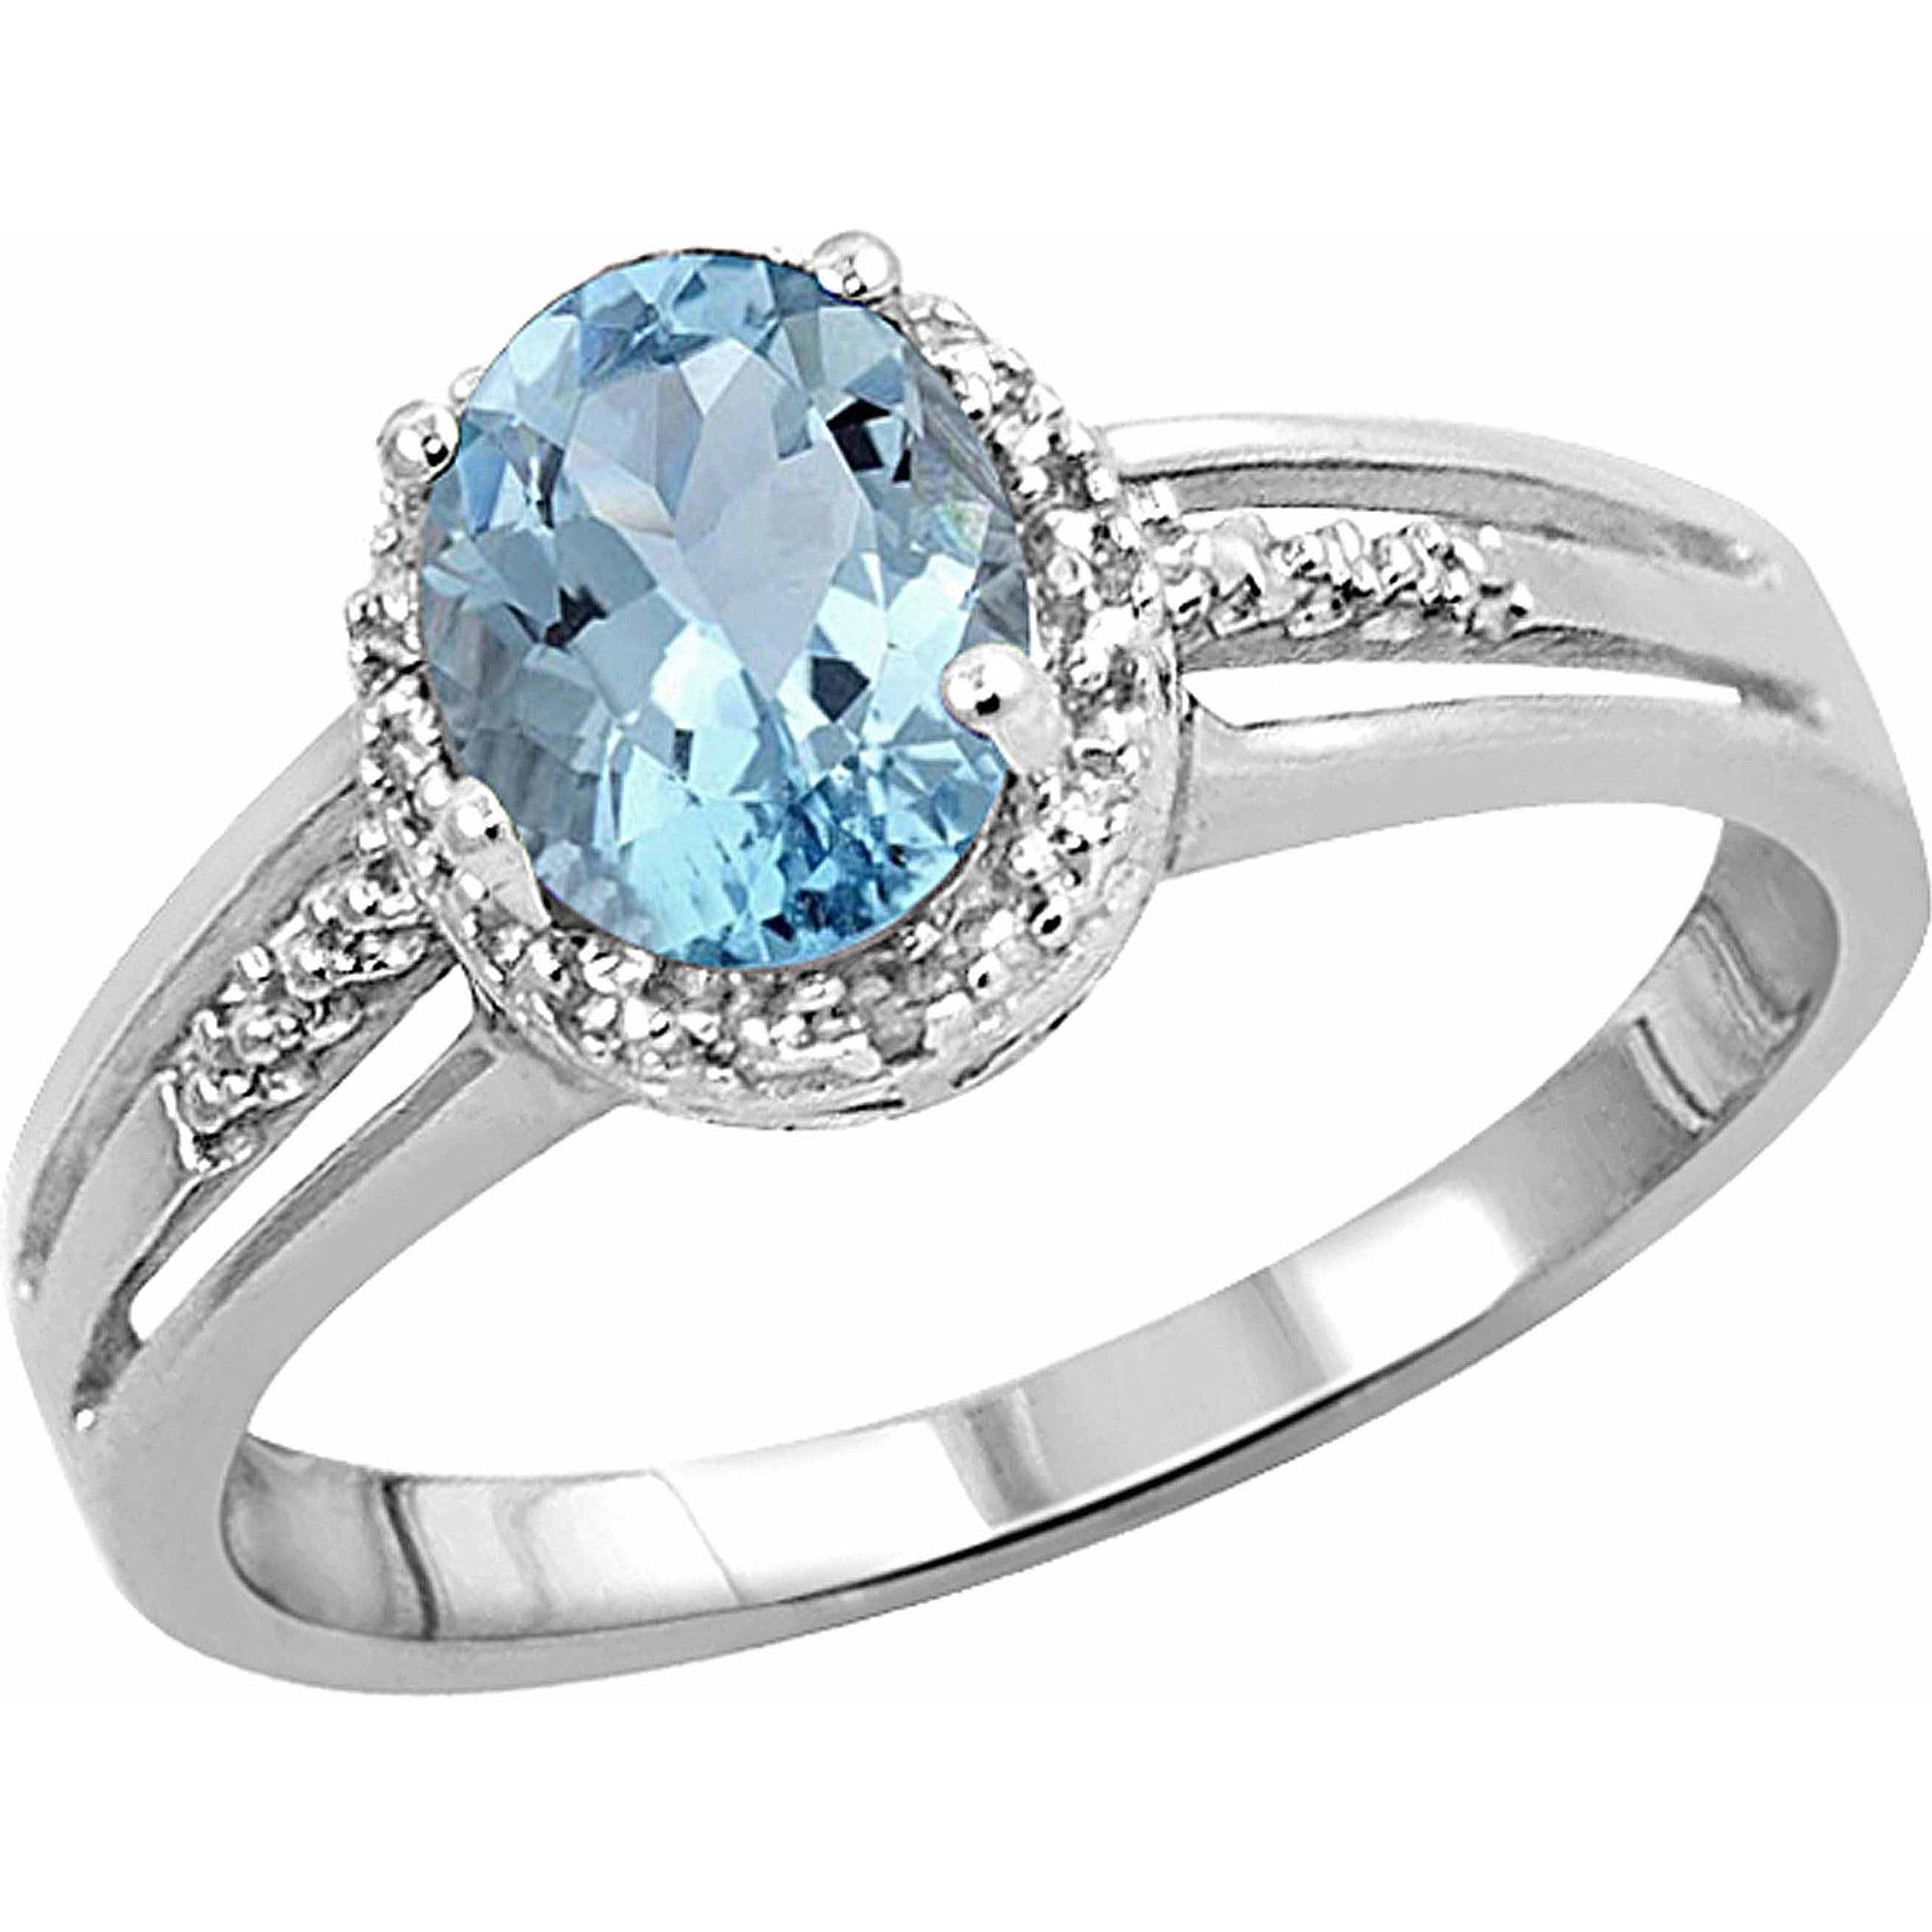 1.15 Carat T.G.W. Aquamarine Gemstone and White Diamond Accent Ring by JewelersClub